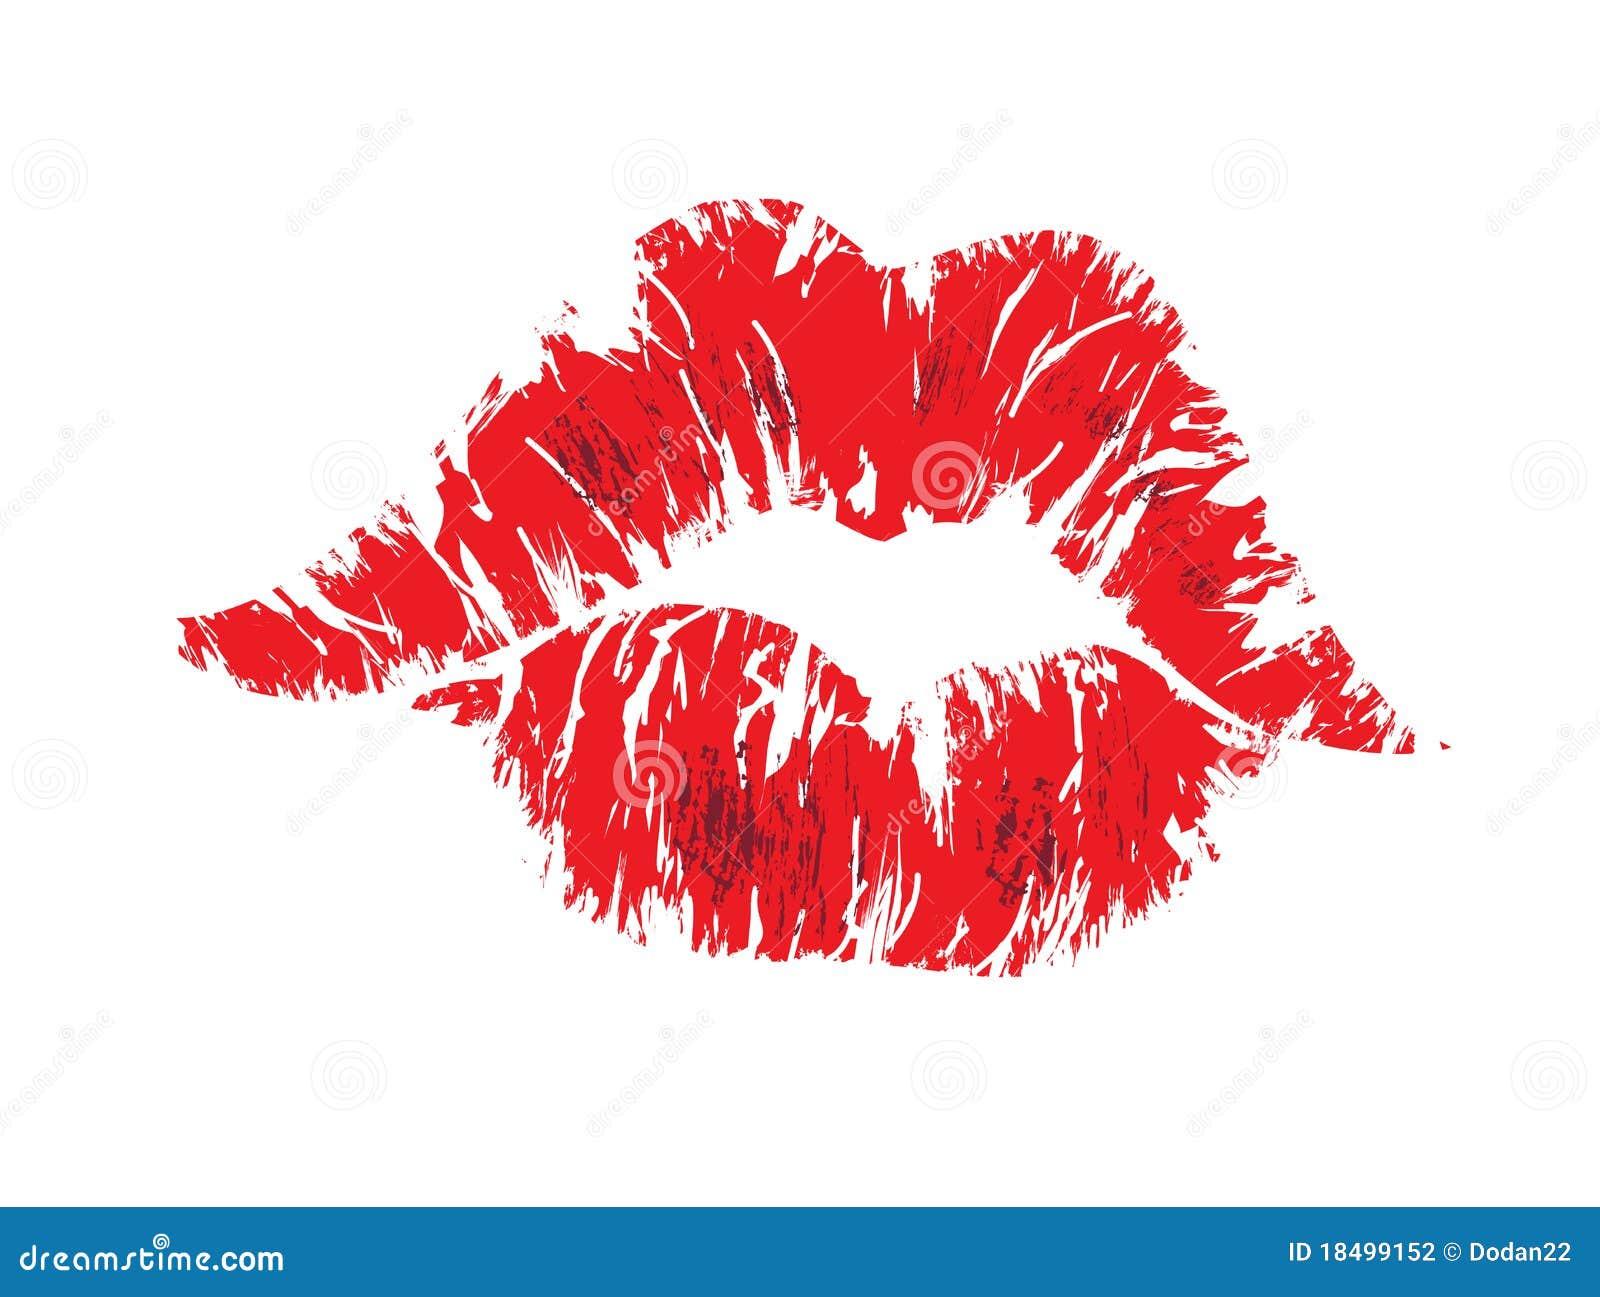 kiss lips stock photography image 18499152 hospital bed clipart free hospital bed clipart free